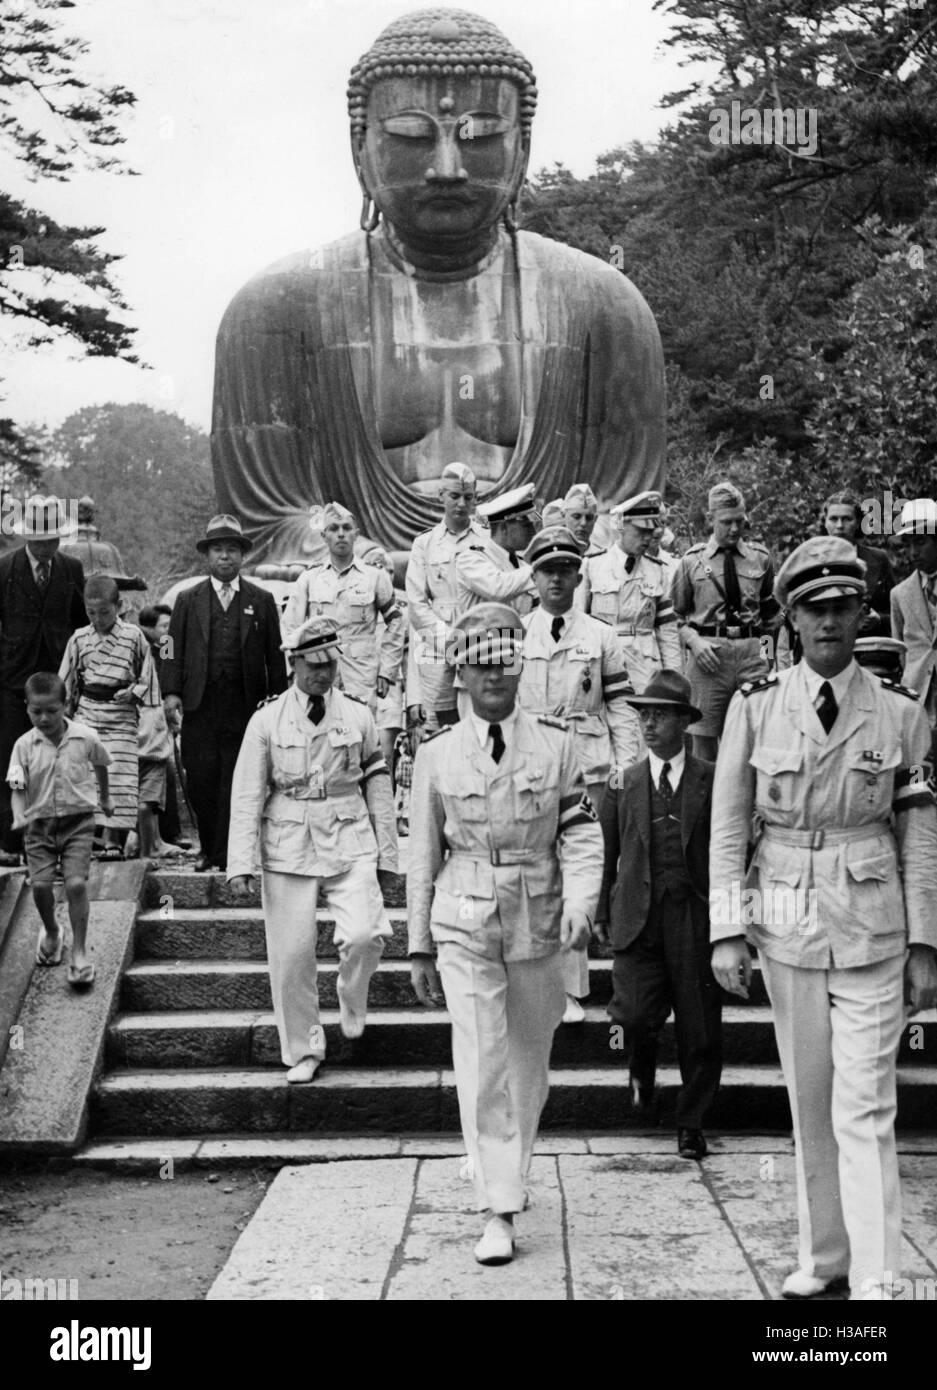 HJ delegation at Kotoku-in, 1940 - Stock Image